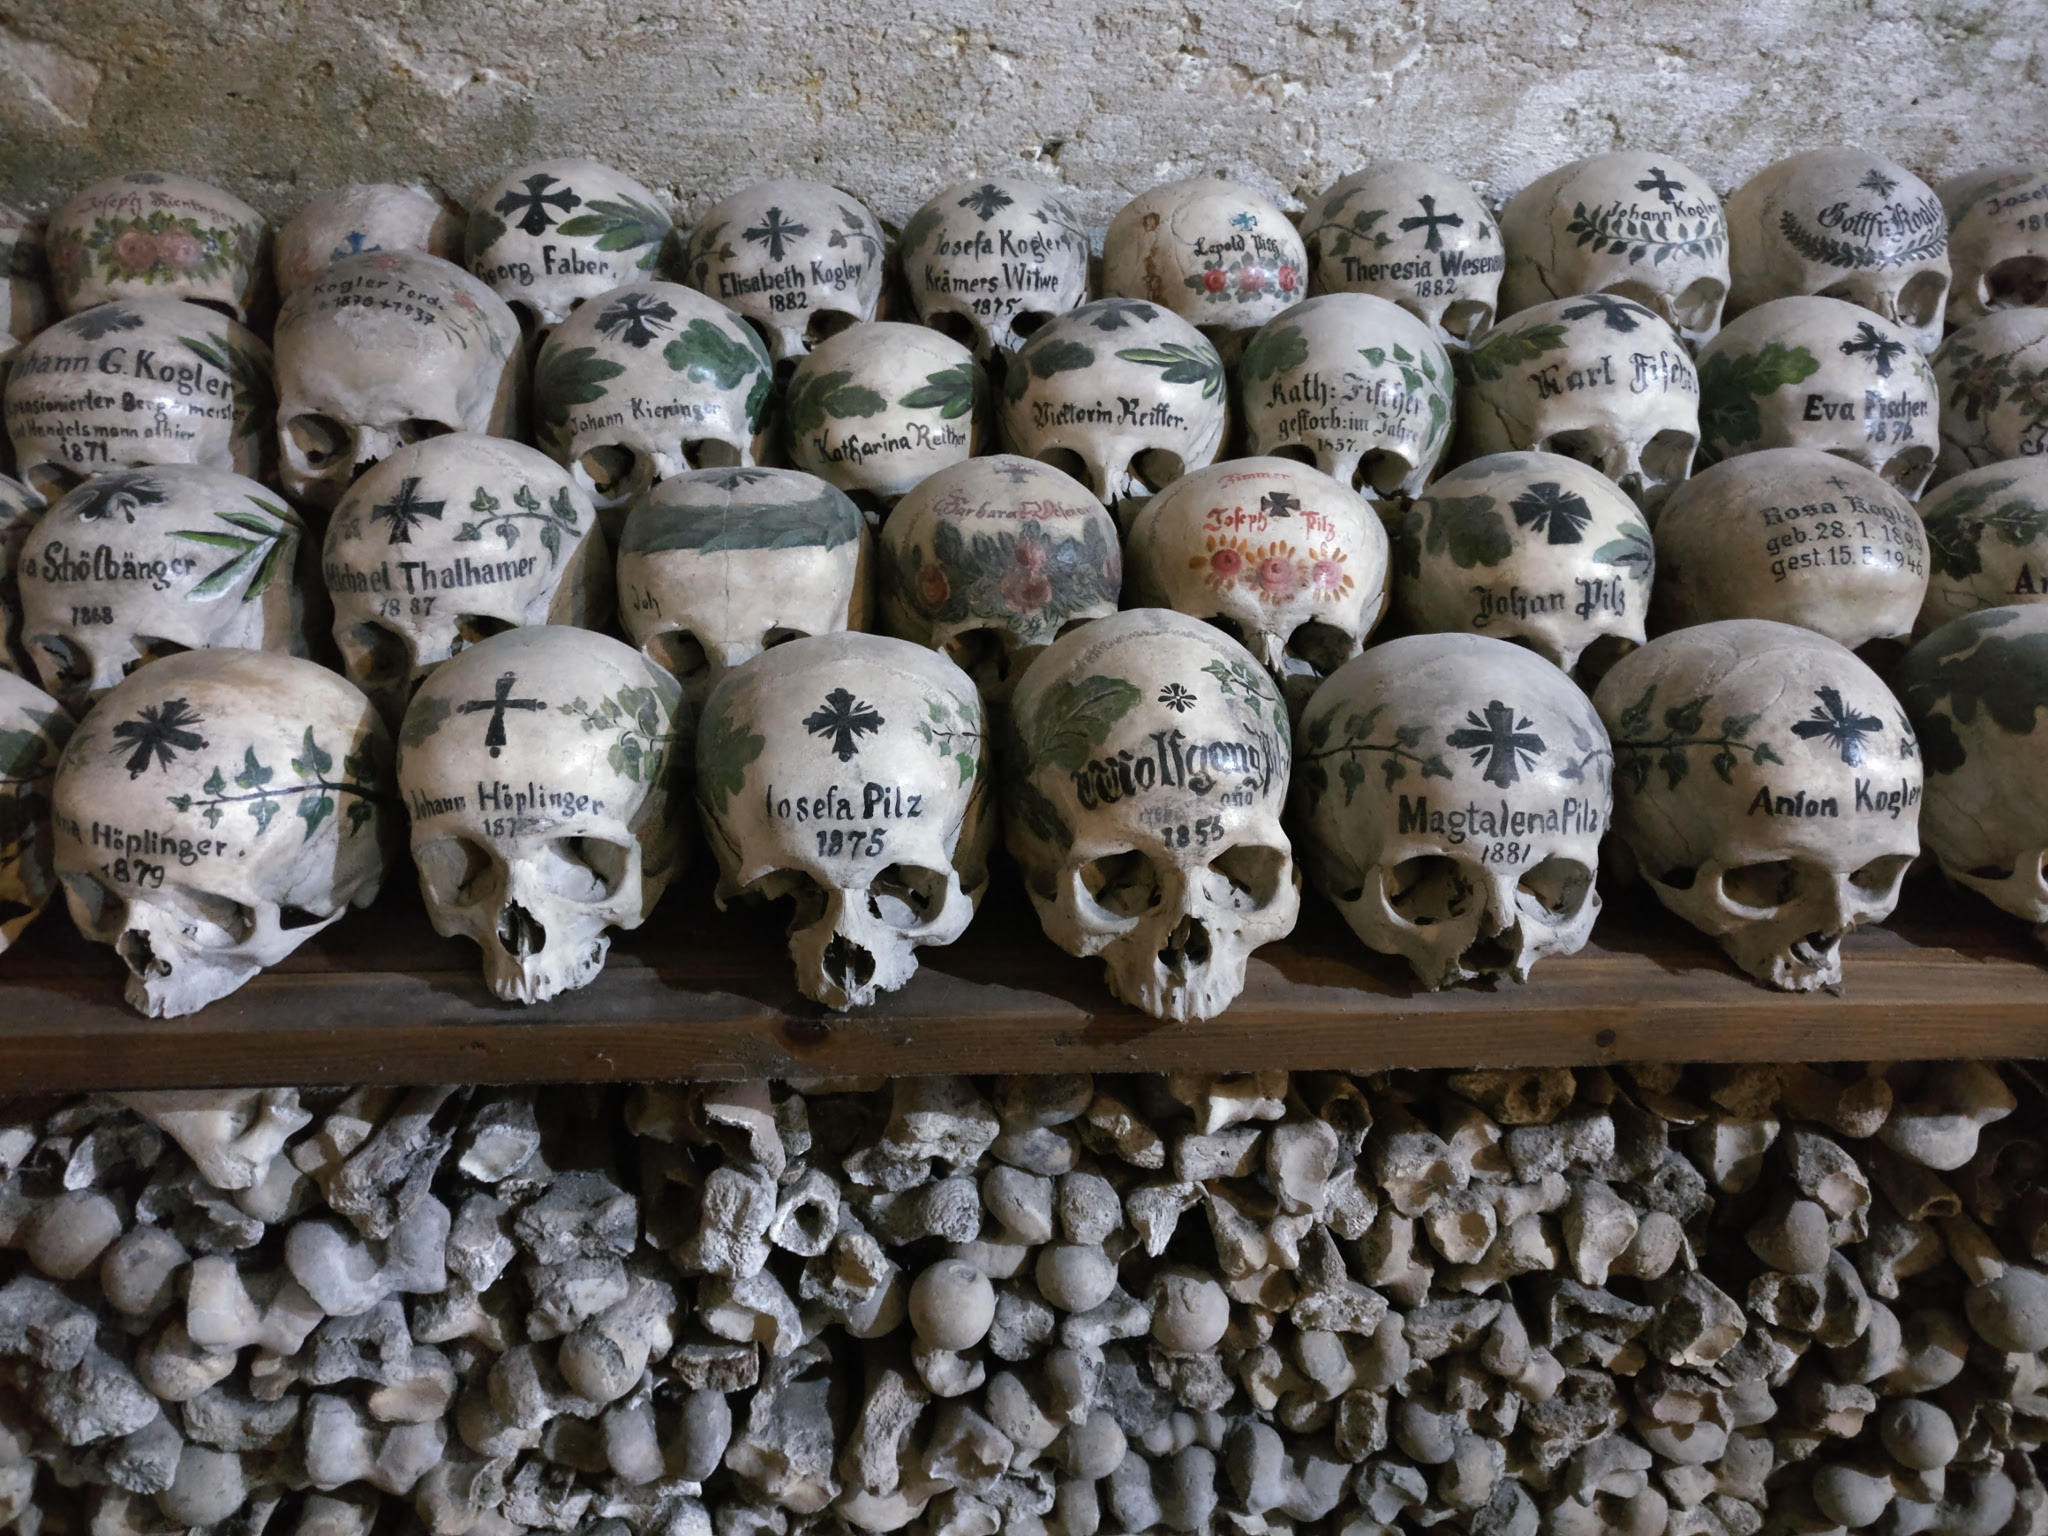 Hallstatt Beinhaus, where you can show off your skull forever